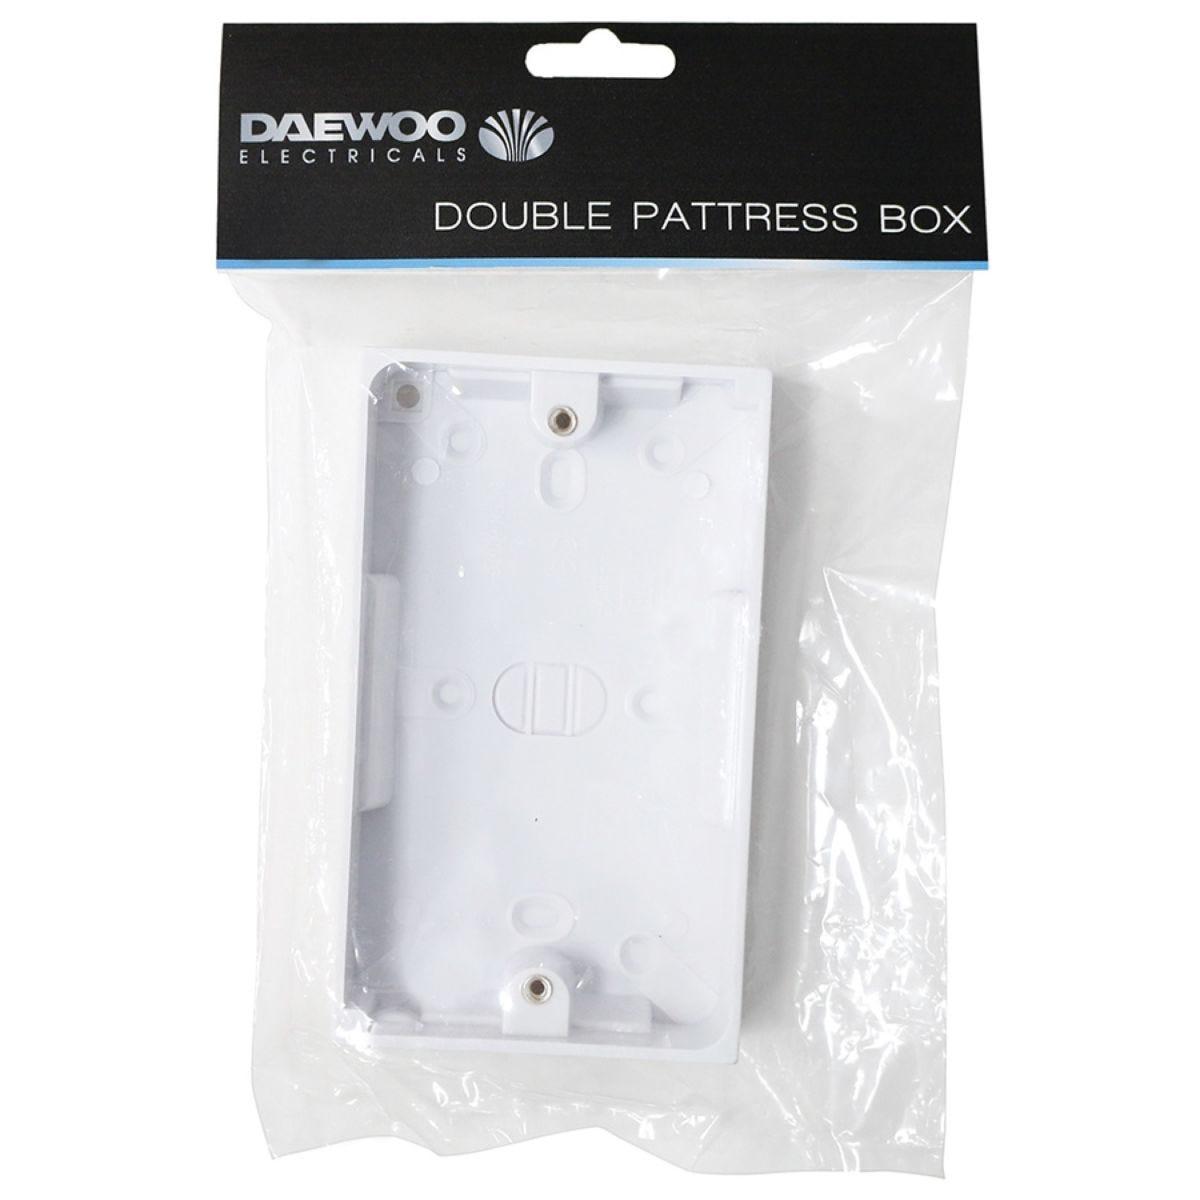 Daewoo Pattress Box - Double